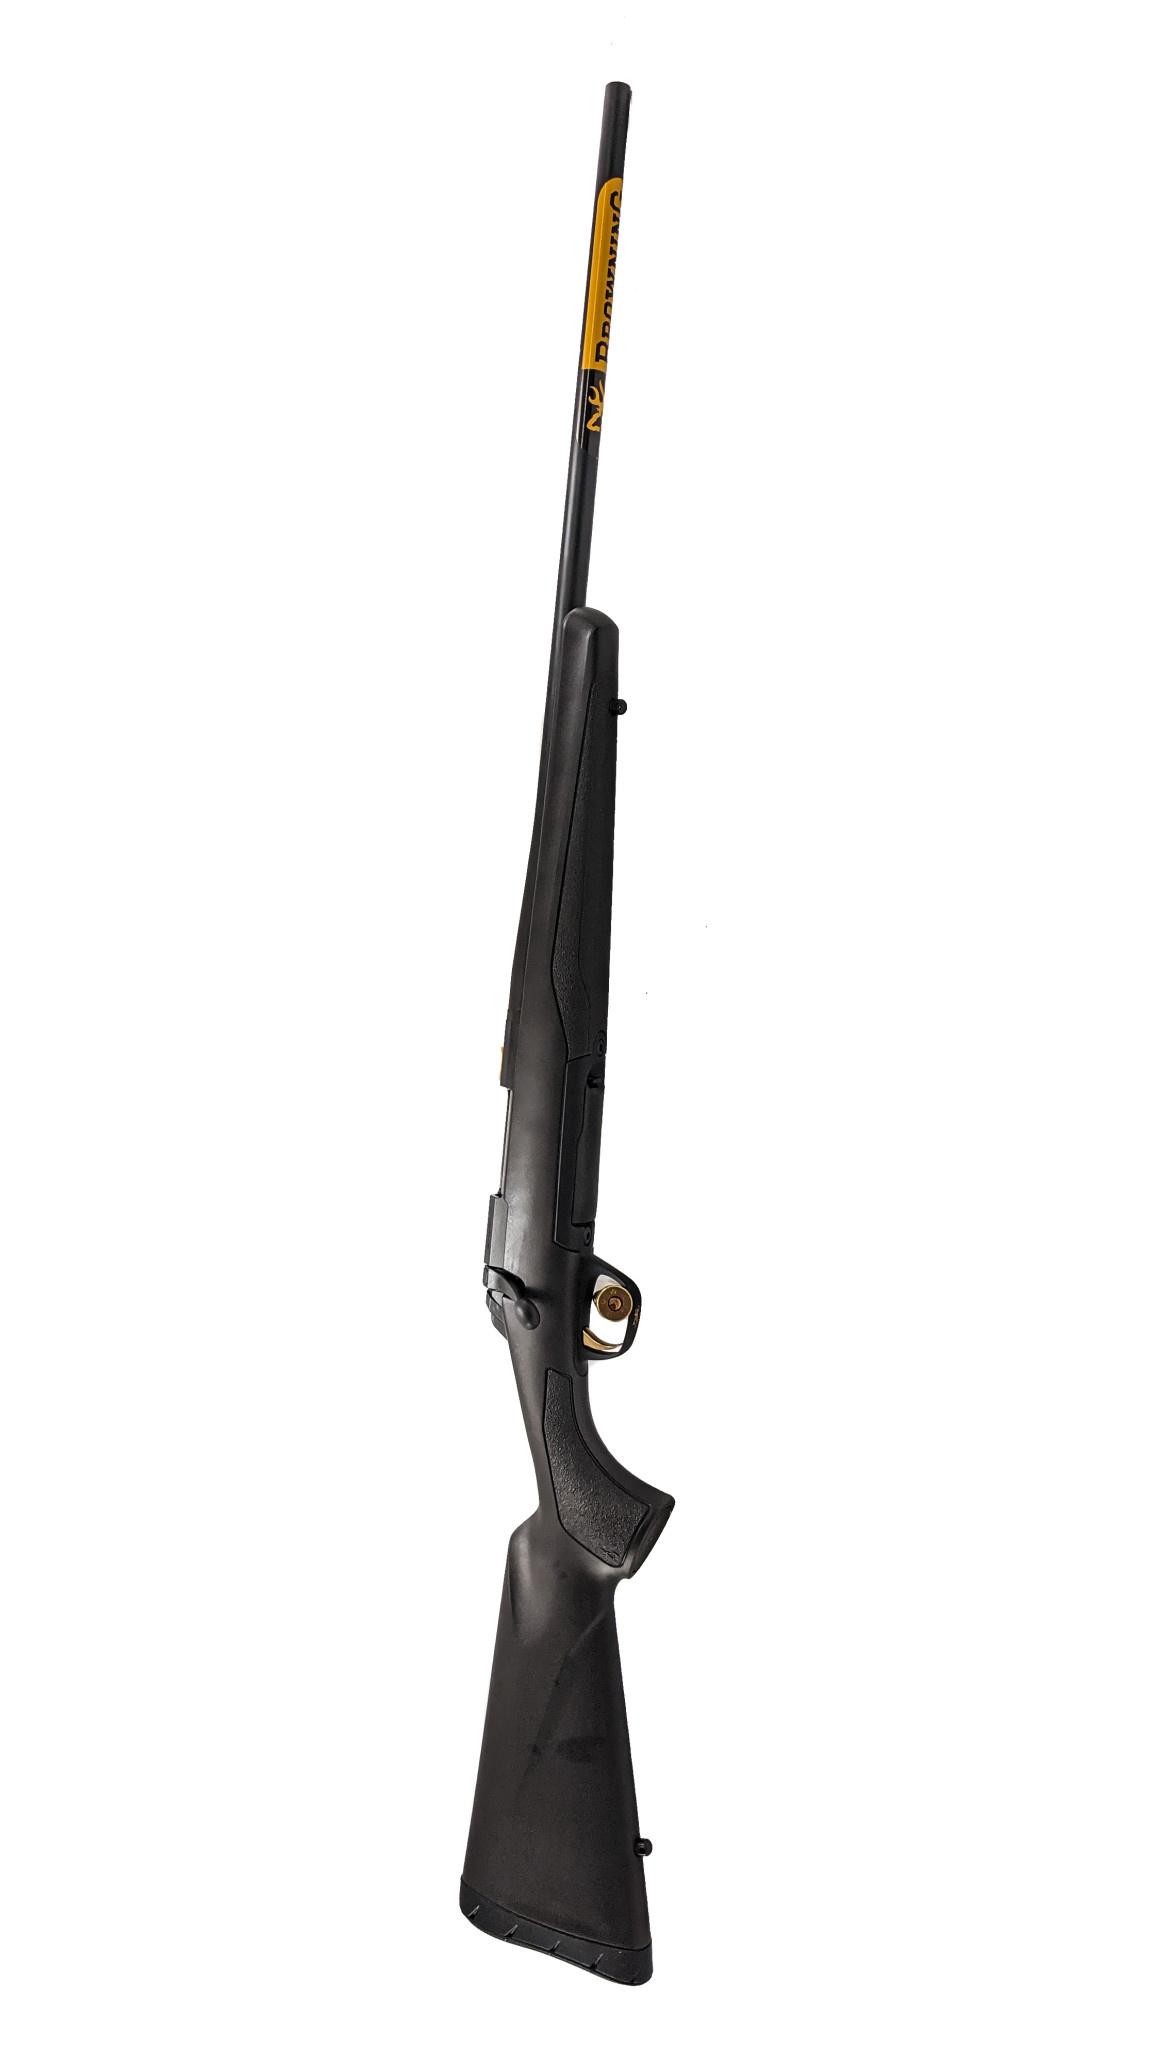 Browning X-bolt Composite Stalker 6.5 Creedmoor